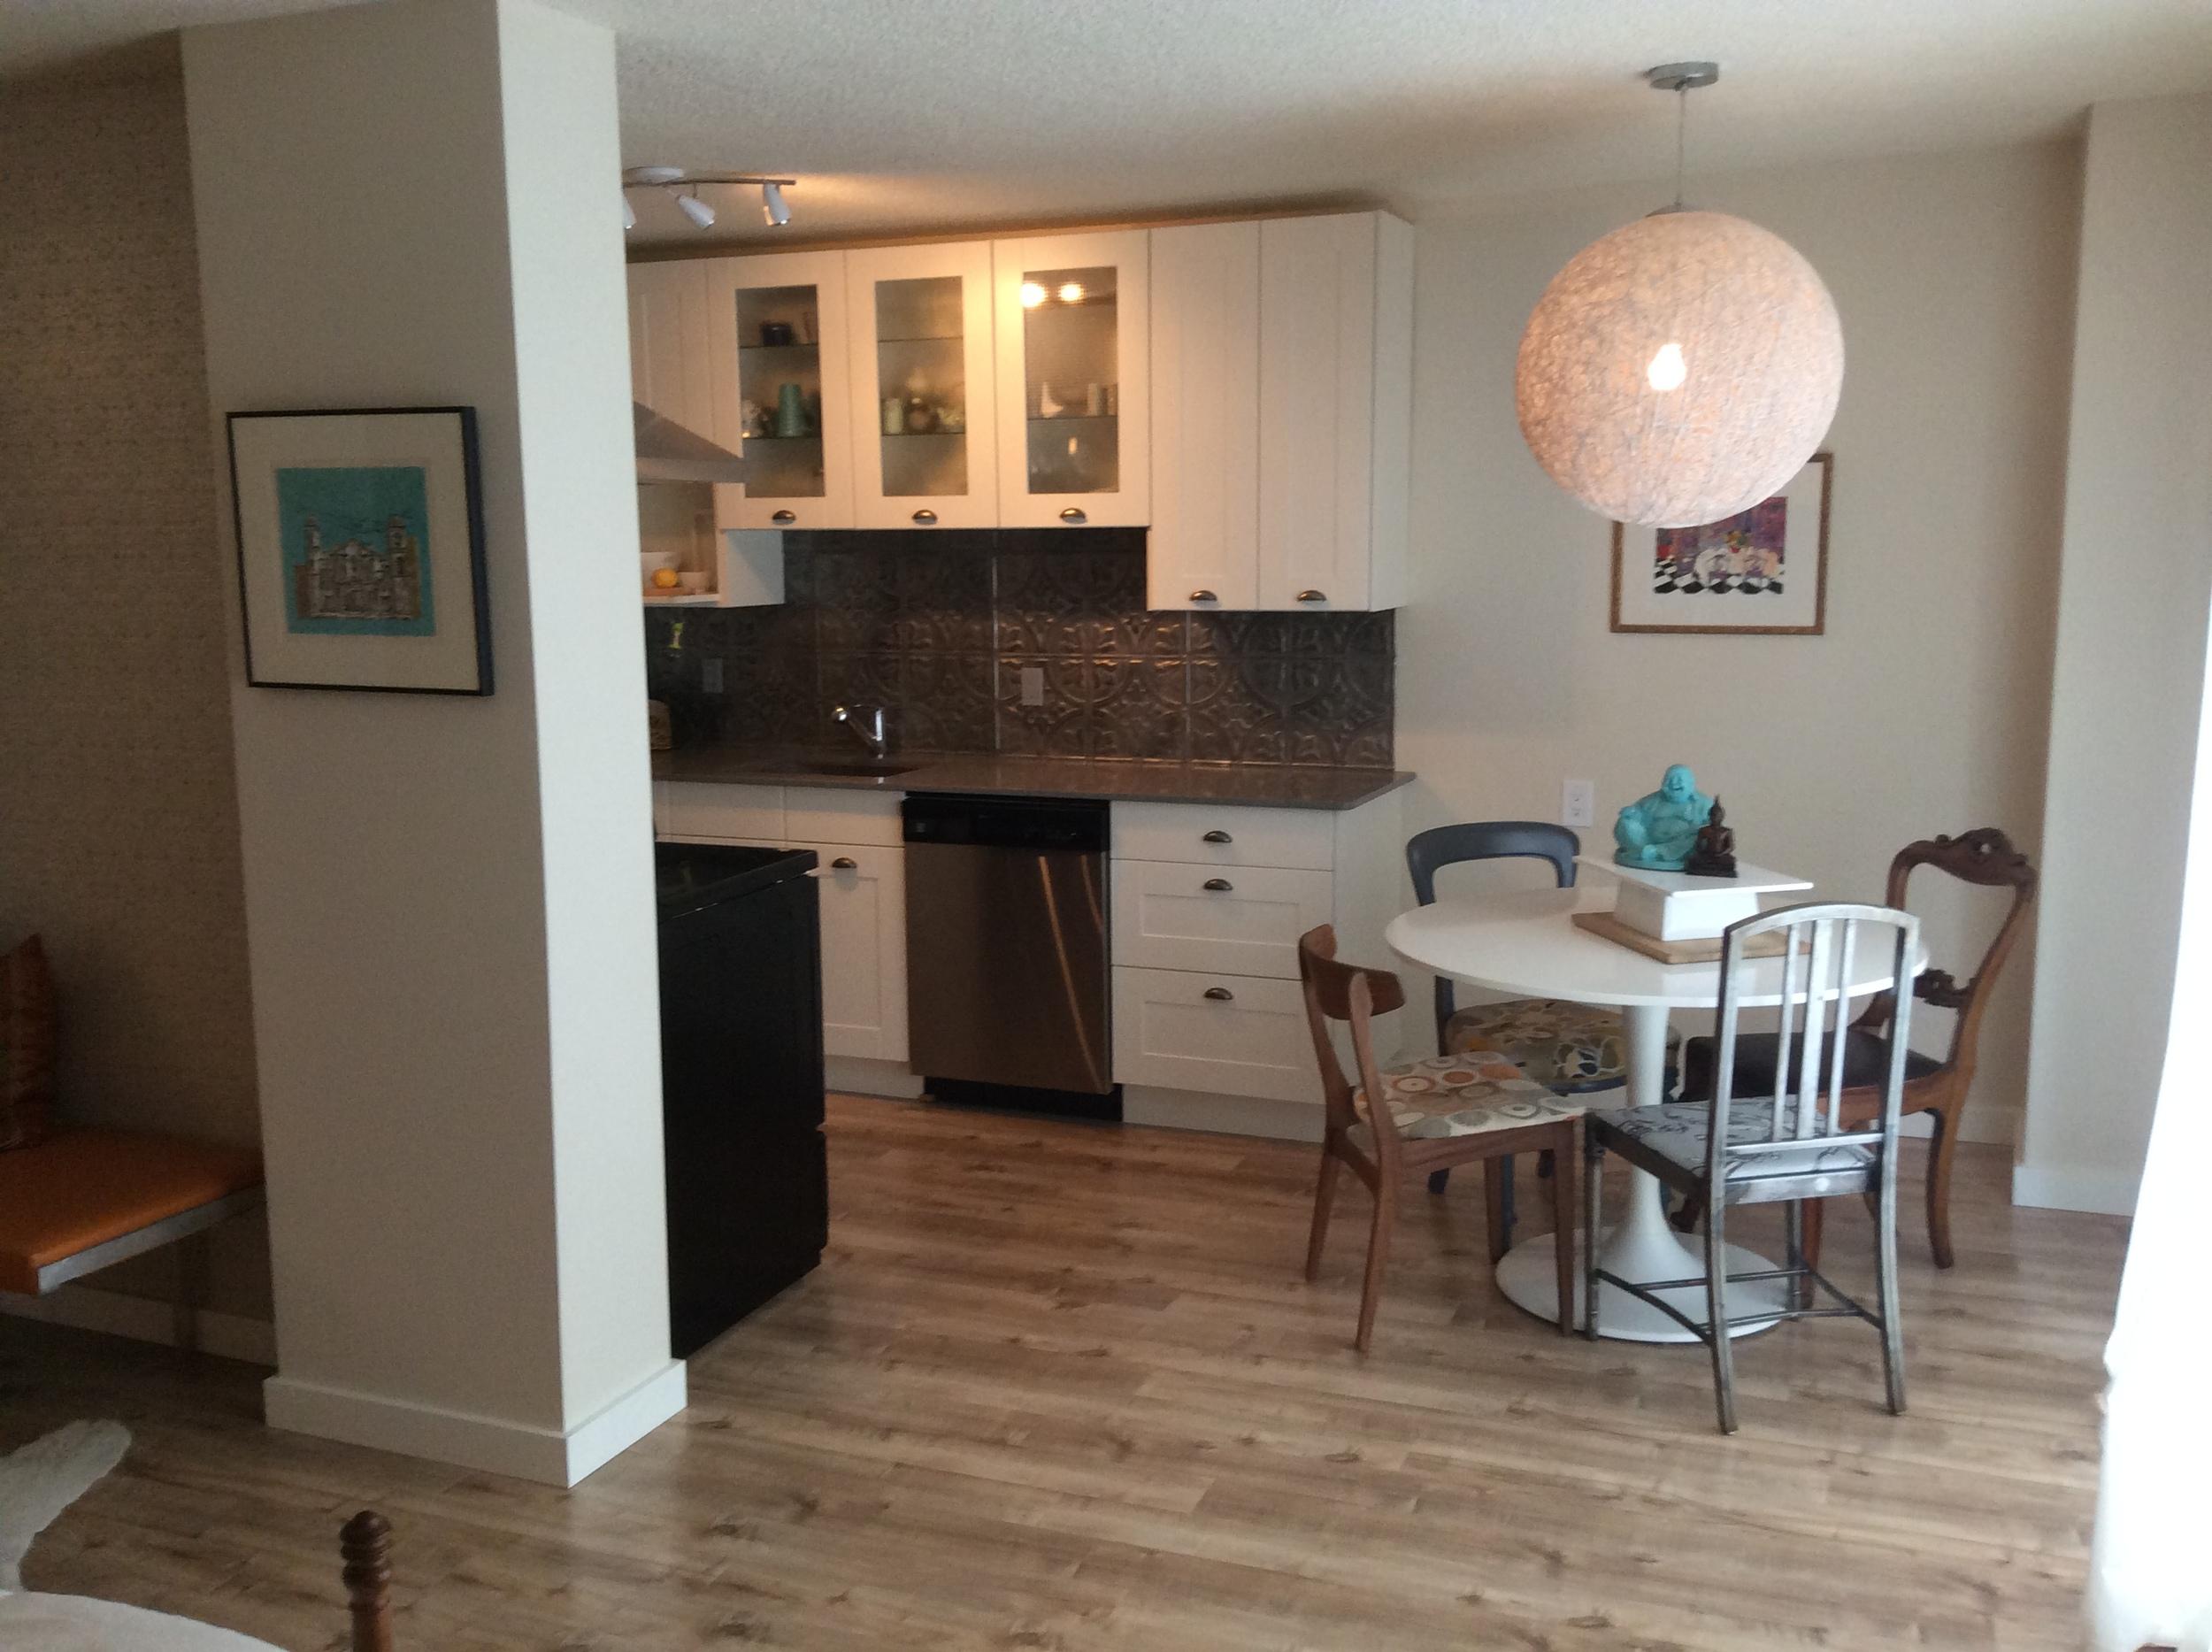 Structube String Light, tulip table, refurbished vintage chairs, Ikea kitchen, tin tile backsplash.